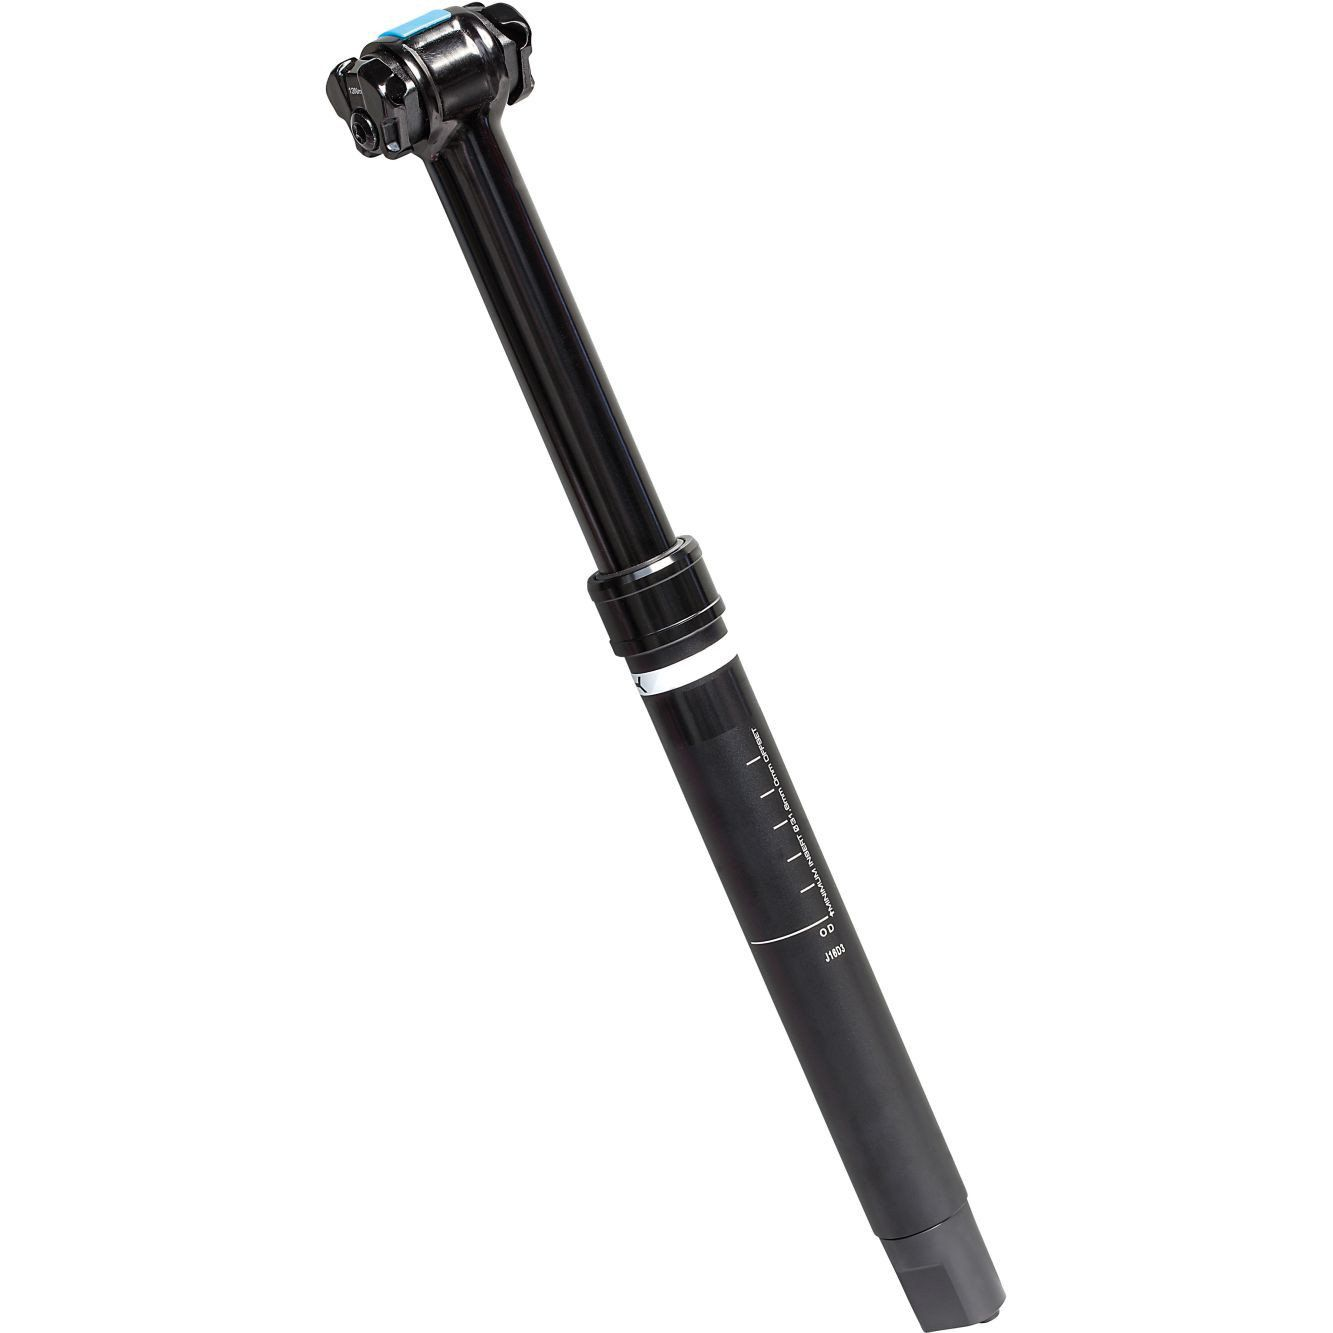 Canote Retrátil Shimano Pro Koryak Adjust - Interno 30.9x400mm